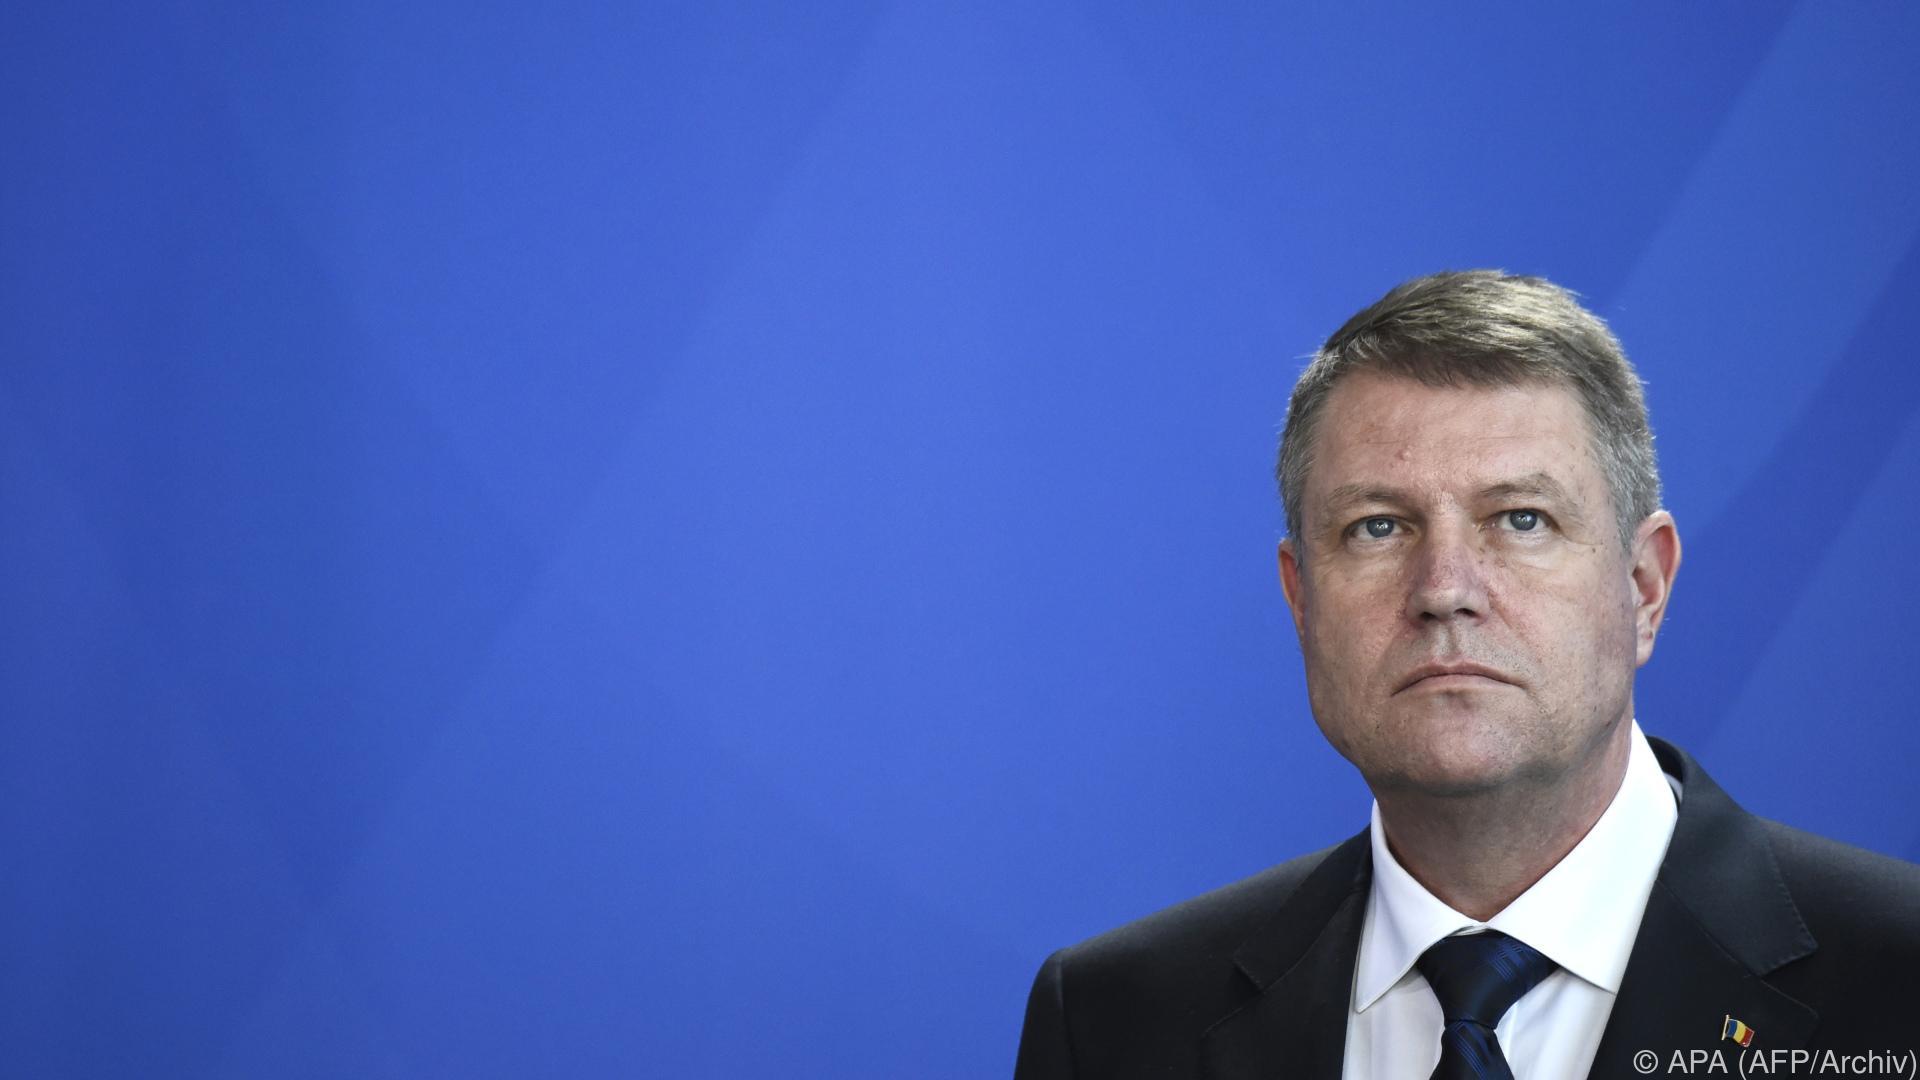 Rumänischer Staatspräsident Johannis erhält Karlspreis 2020